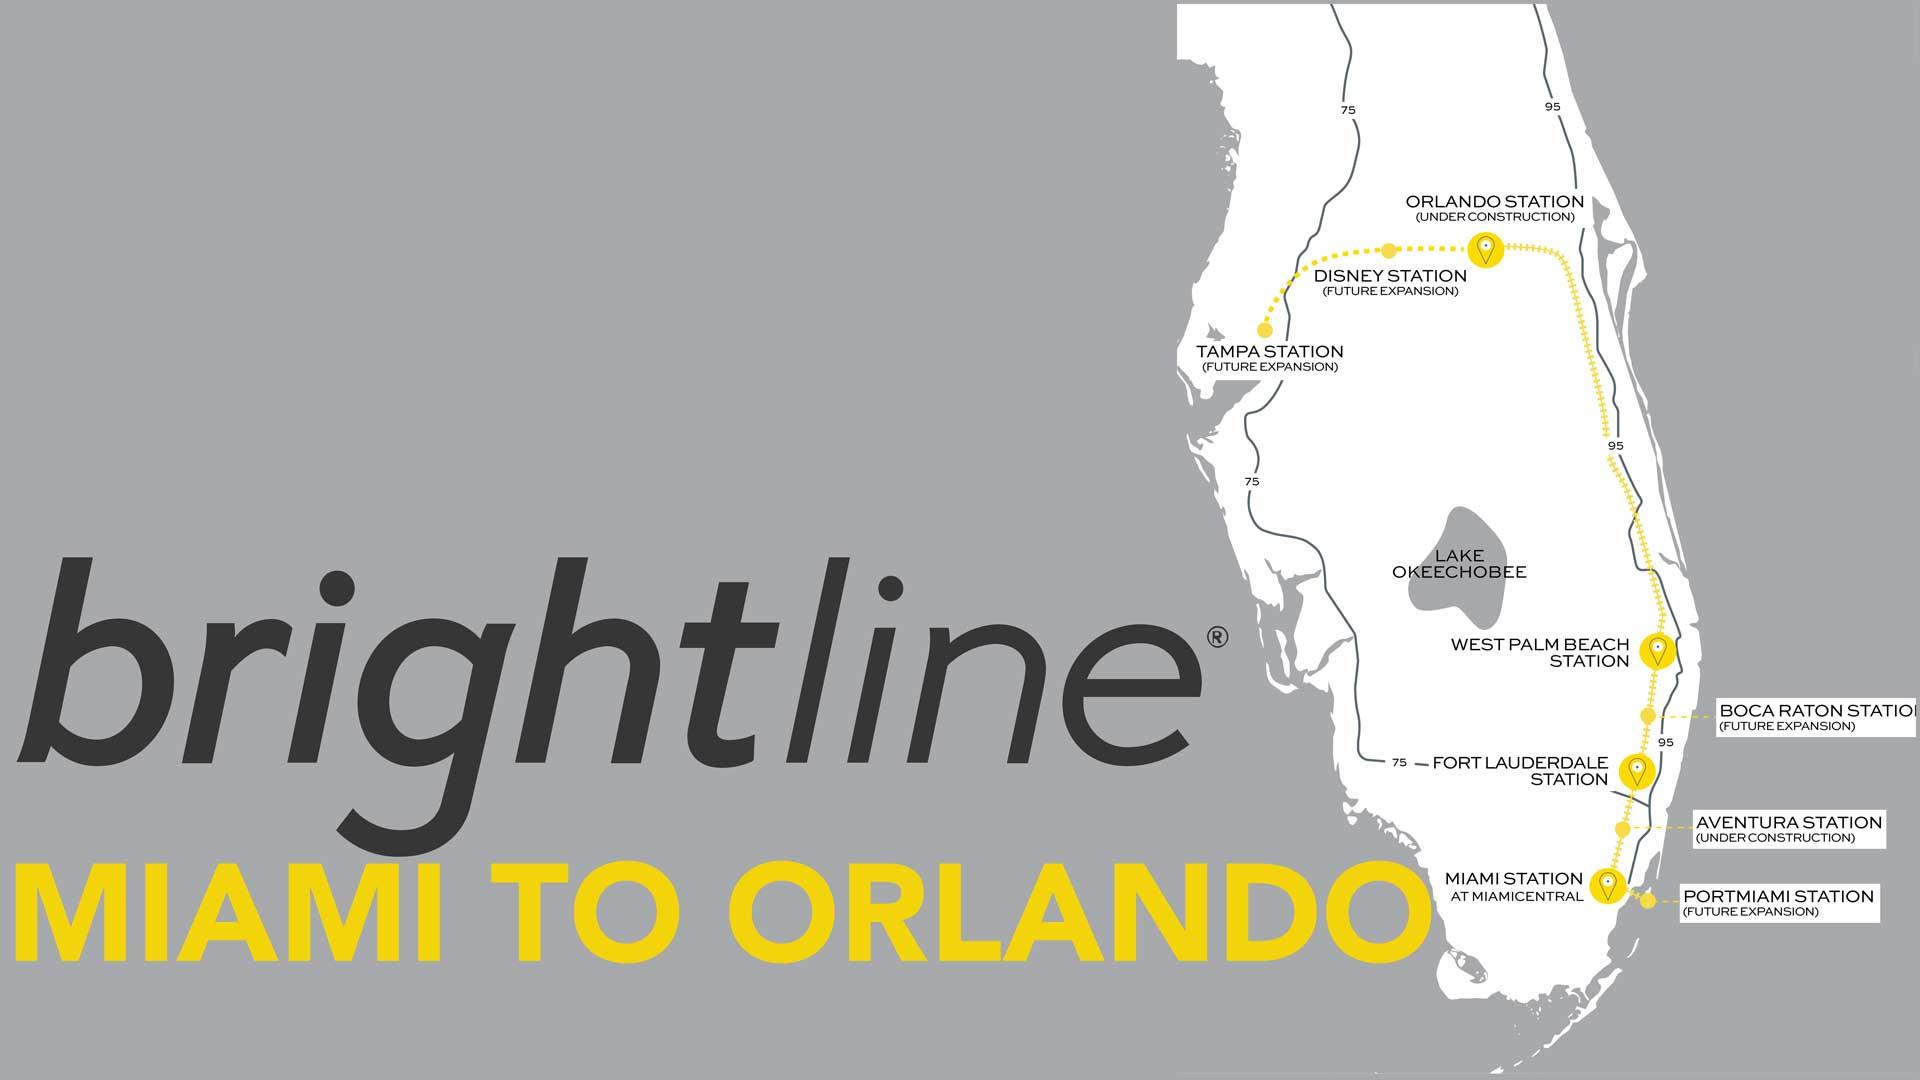 Brightline Miami To Orlando Route Disney Springs Expansion